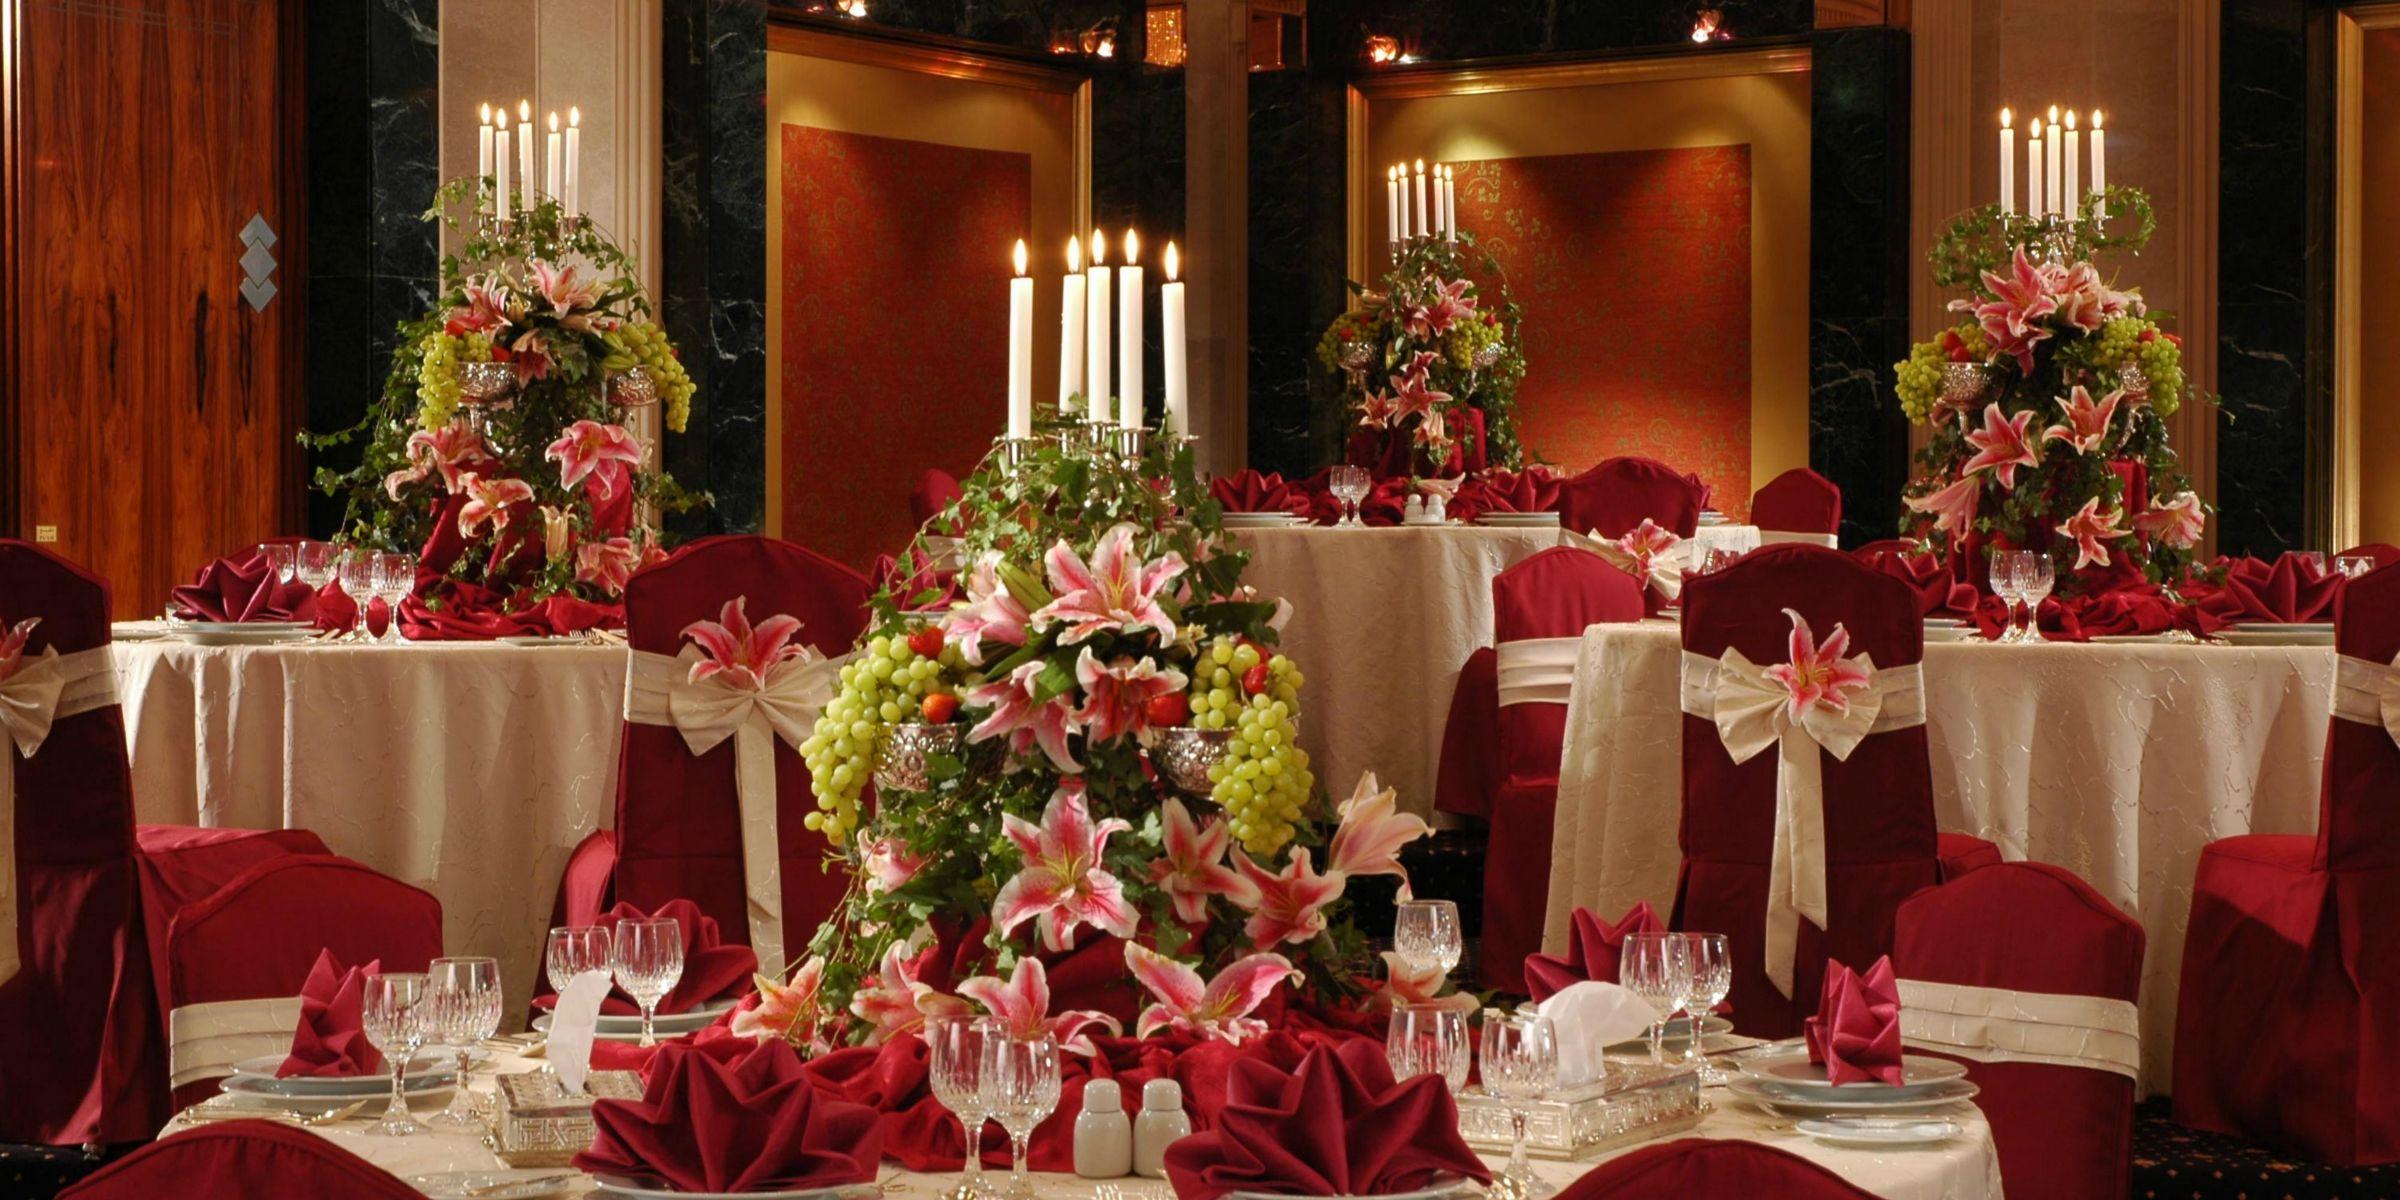 Intercontinental jeddah hotel meeting rooms wedding rentals salo de eventos junglespirit Image collections